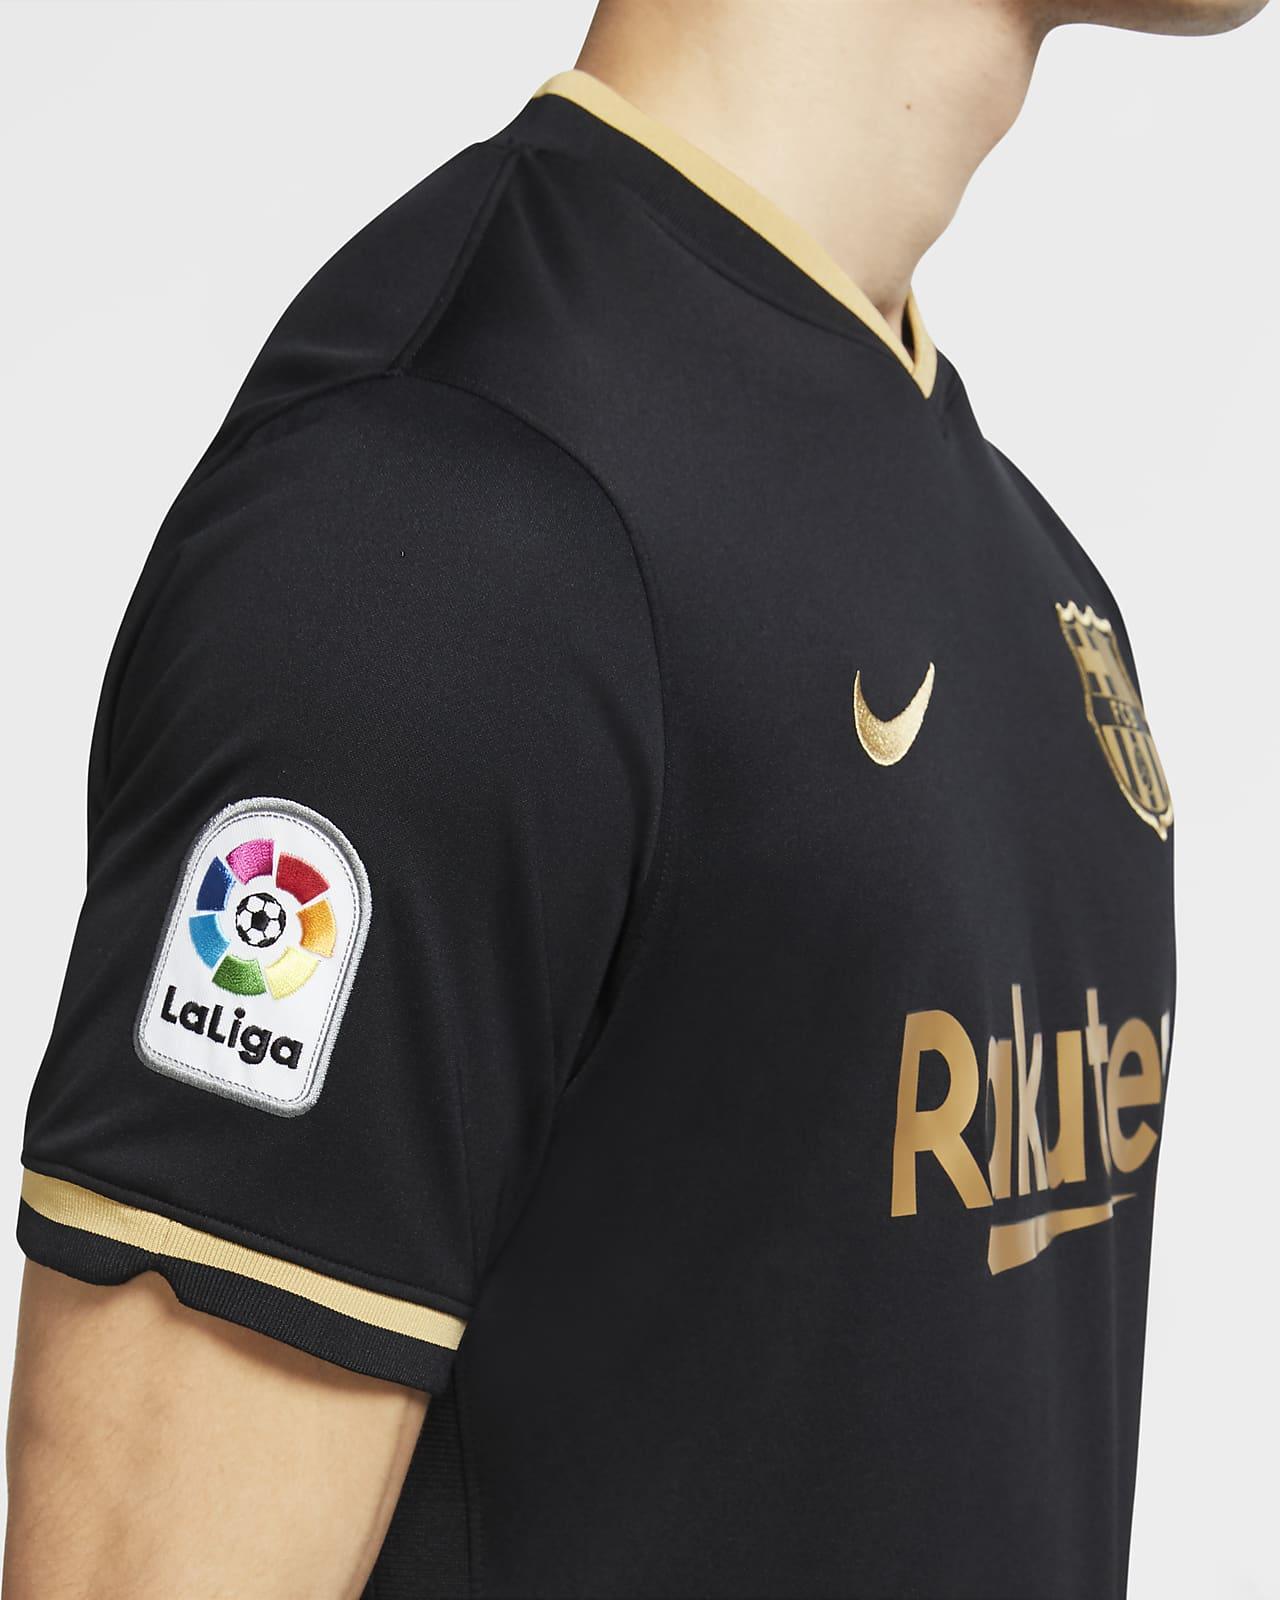 Maglia da calcio FC Barcelona 2020/21 Stadium da uomo - Away